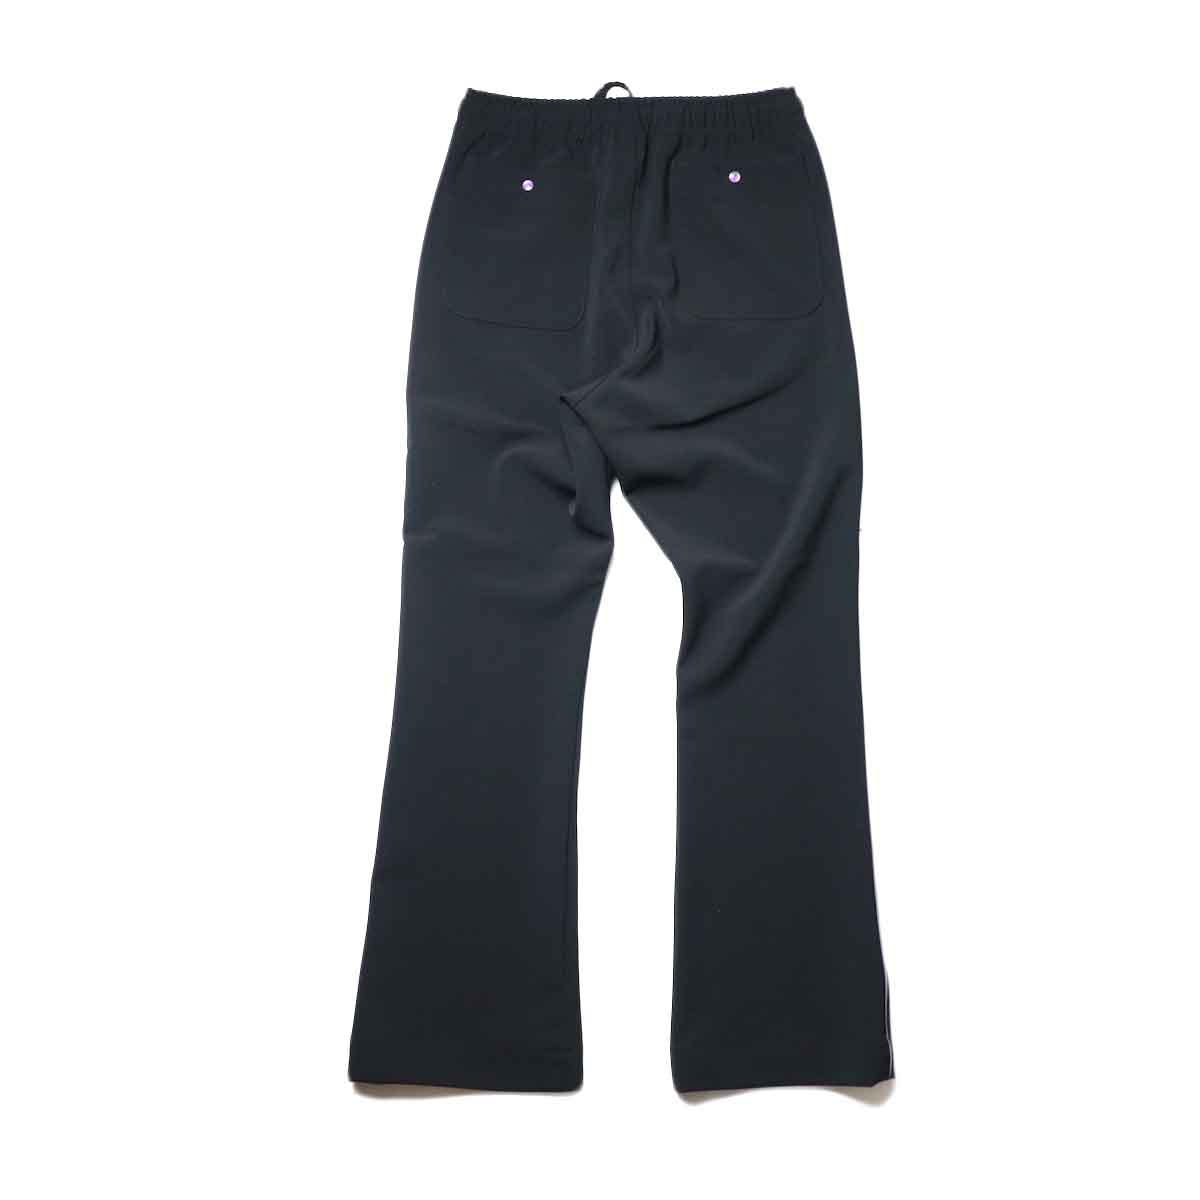 Needles / PIPING COWBOY PANT - PE/PU DOUBLE CLOTH (Black)背面